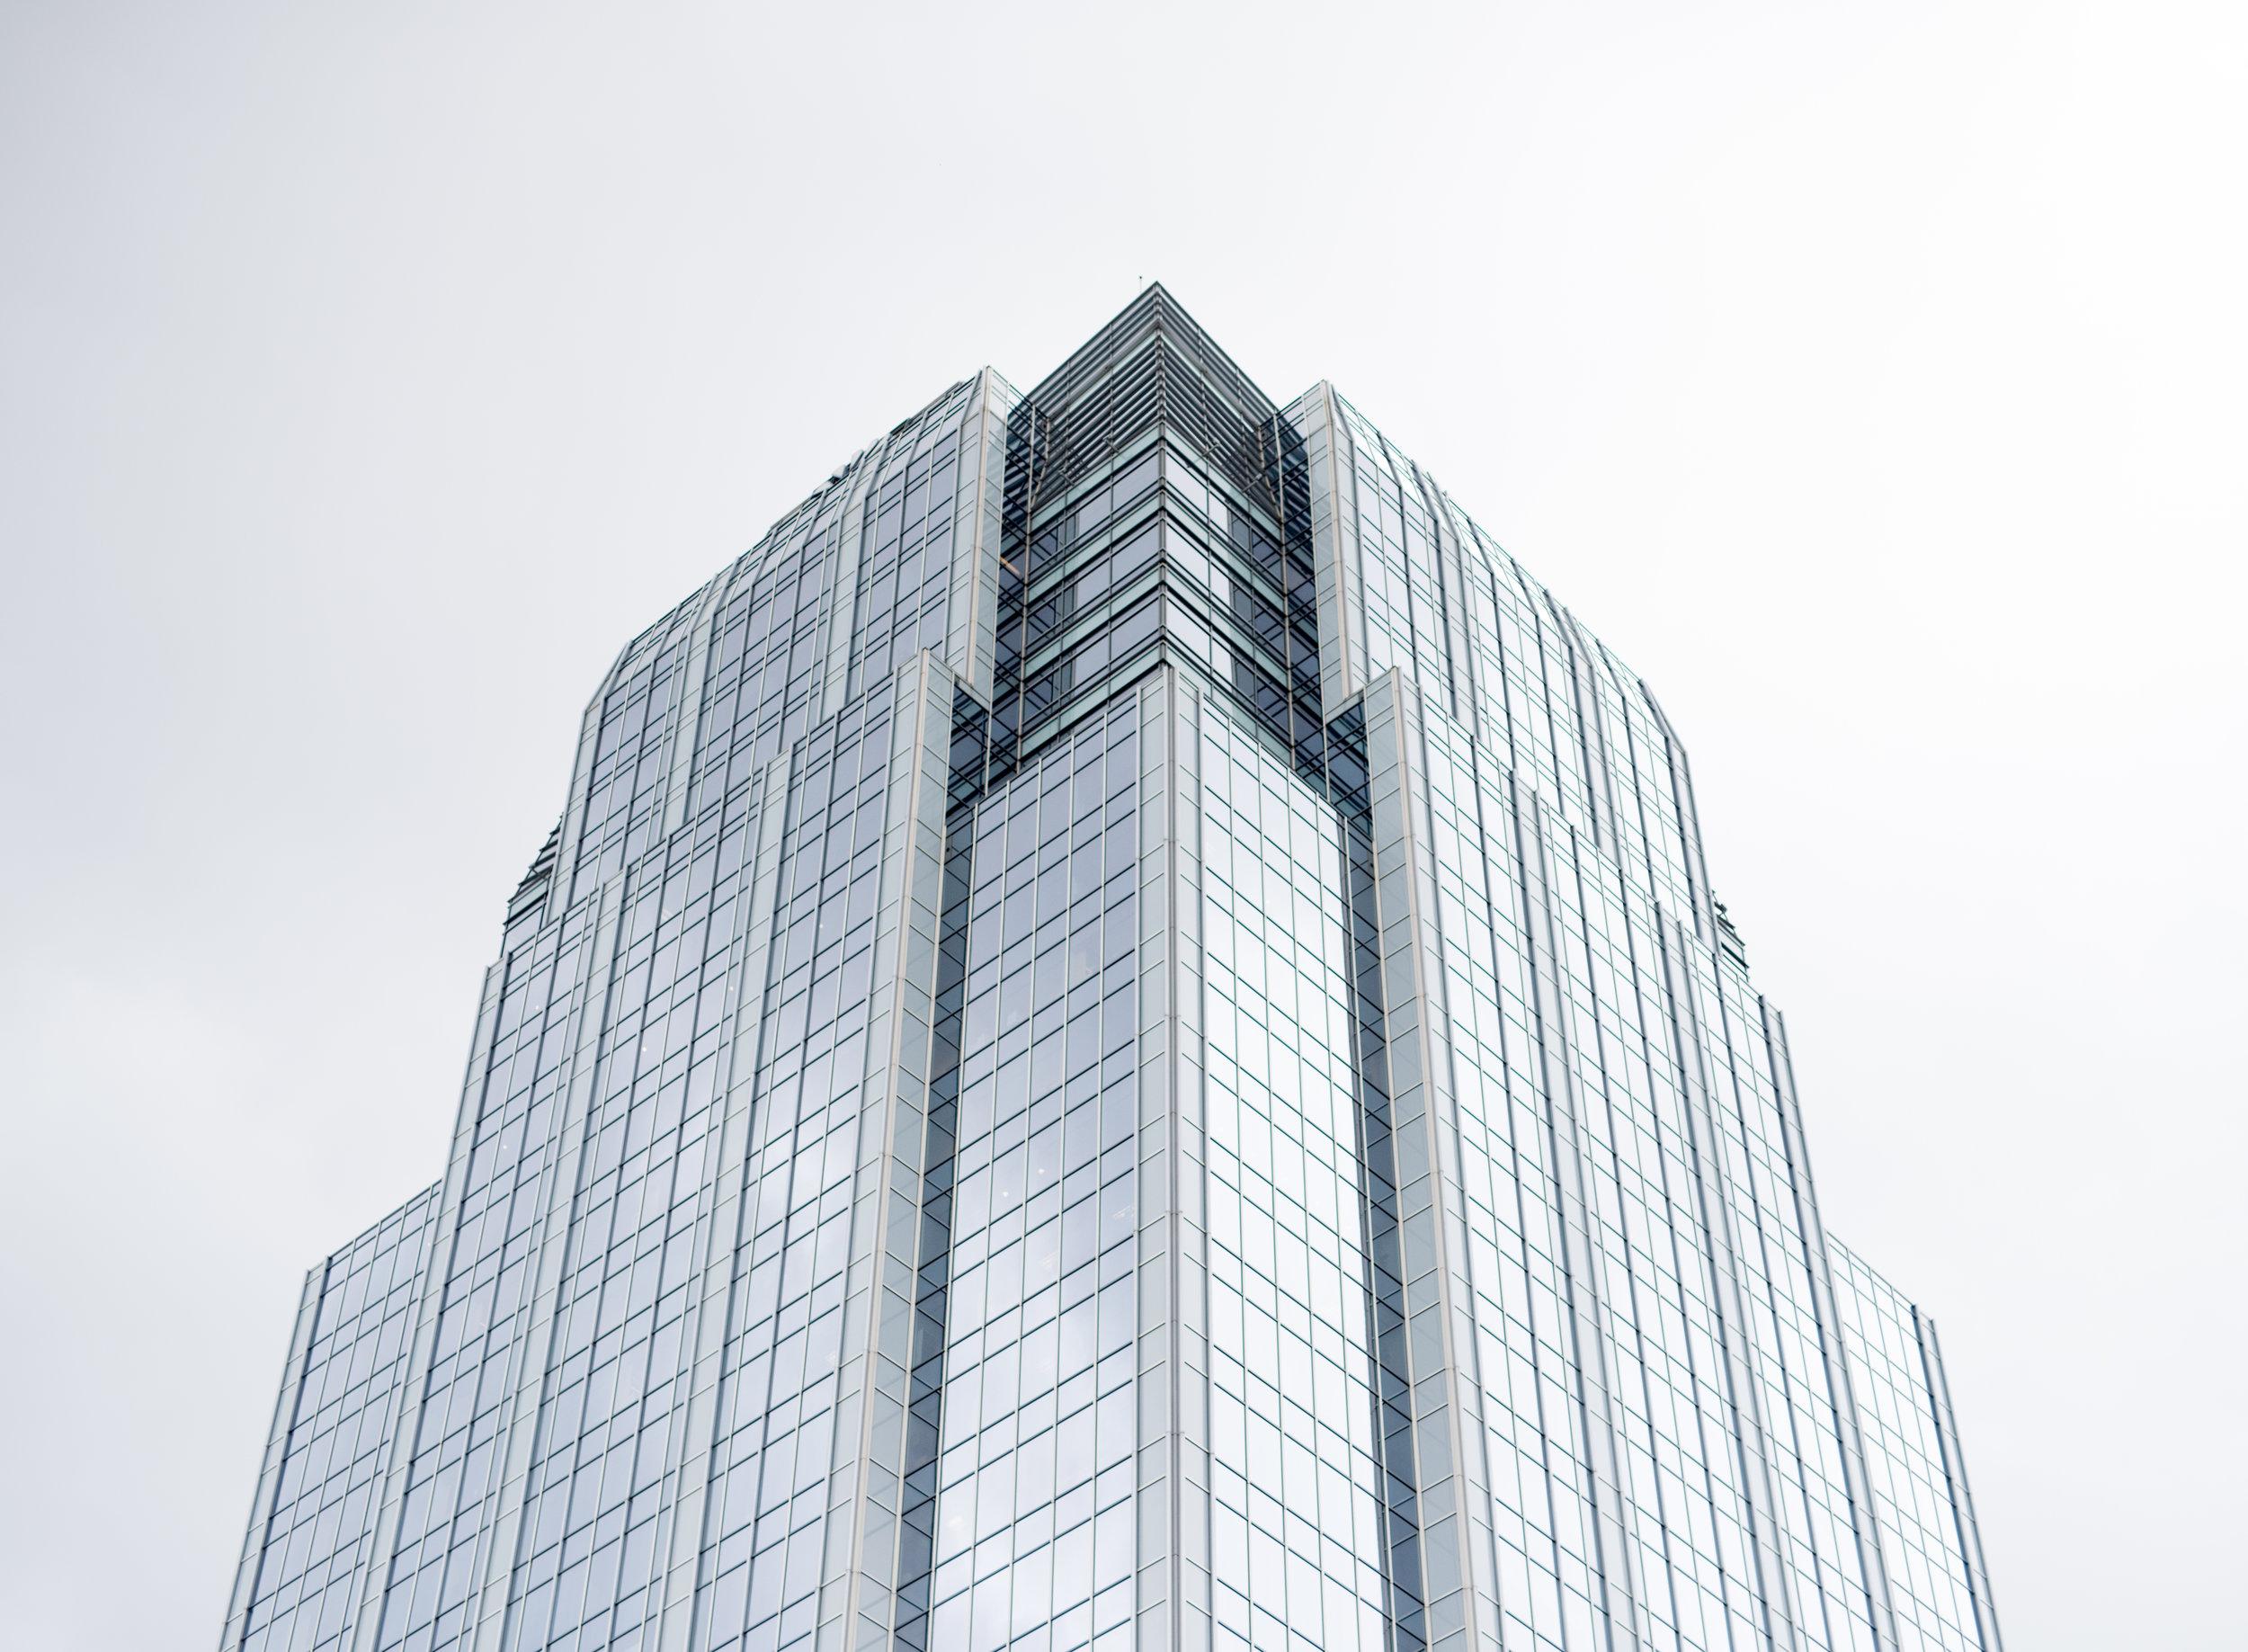 building5 (1 of 1) copy.jpg